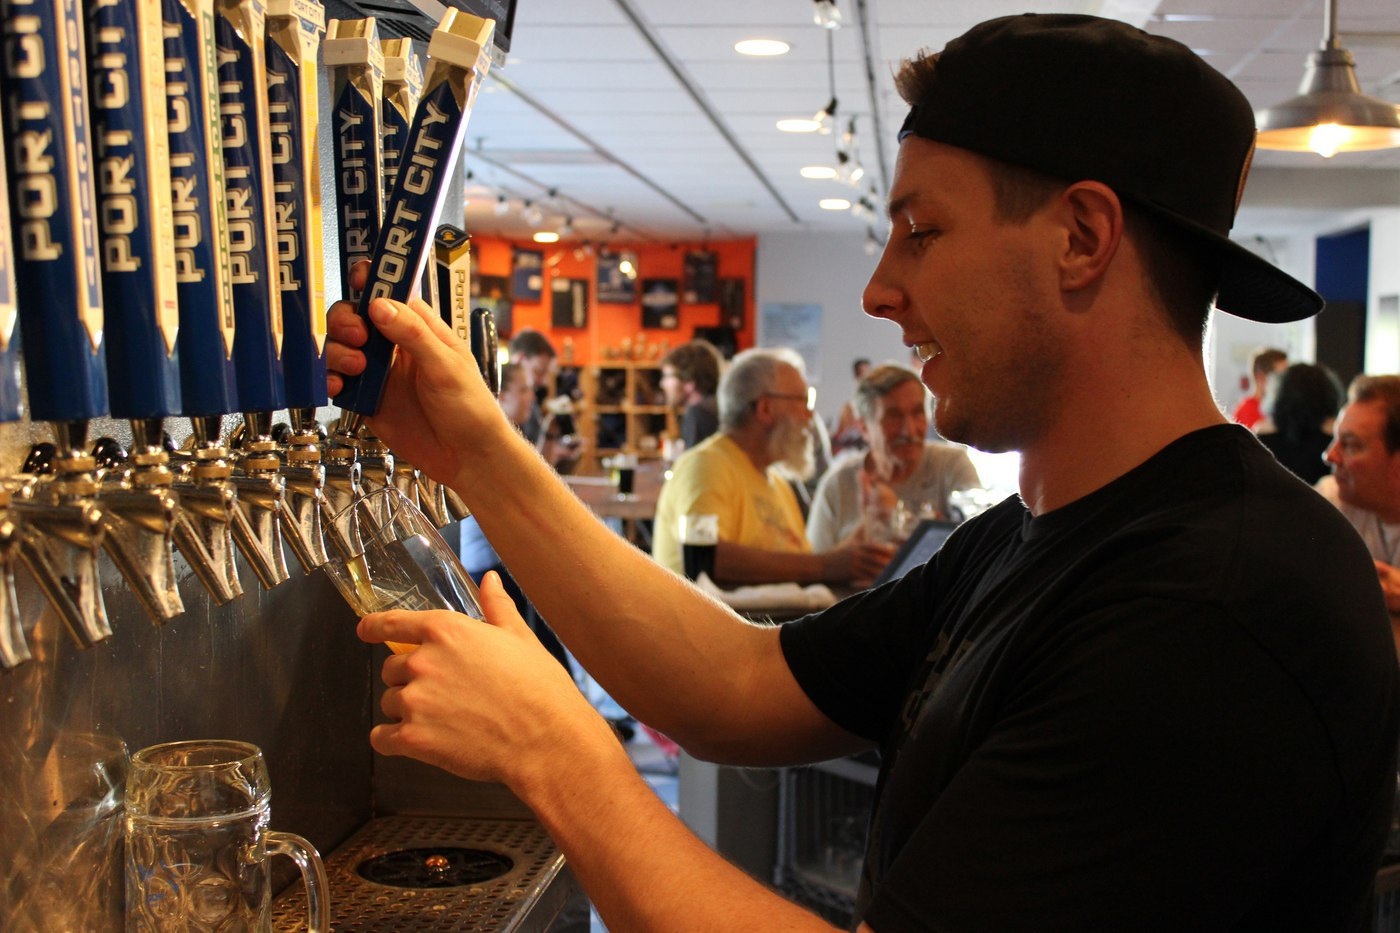 Port_City_Brewing_Company